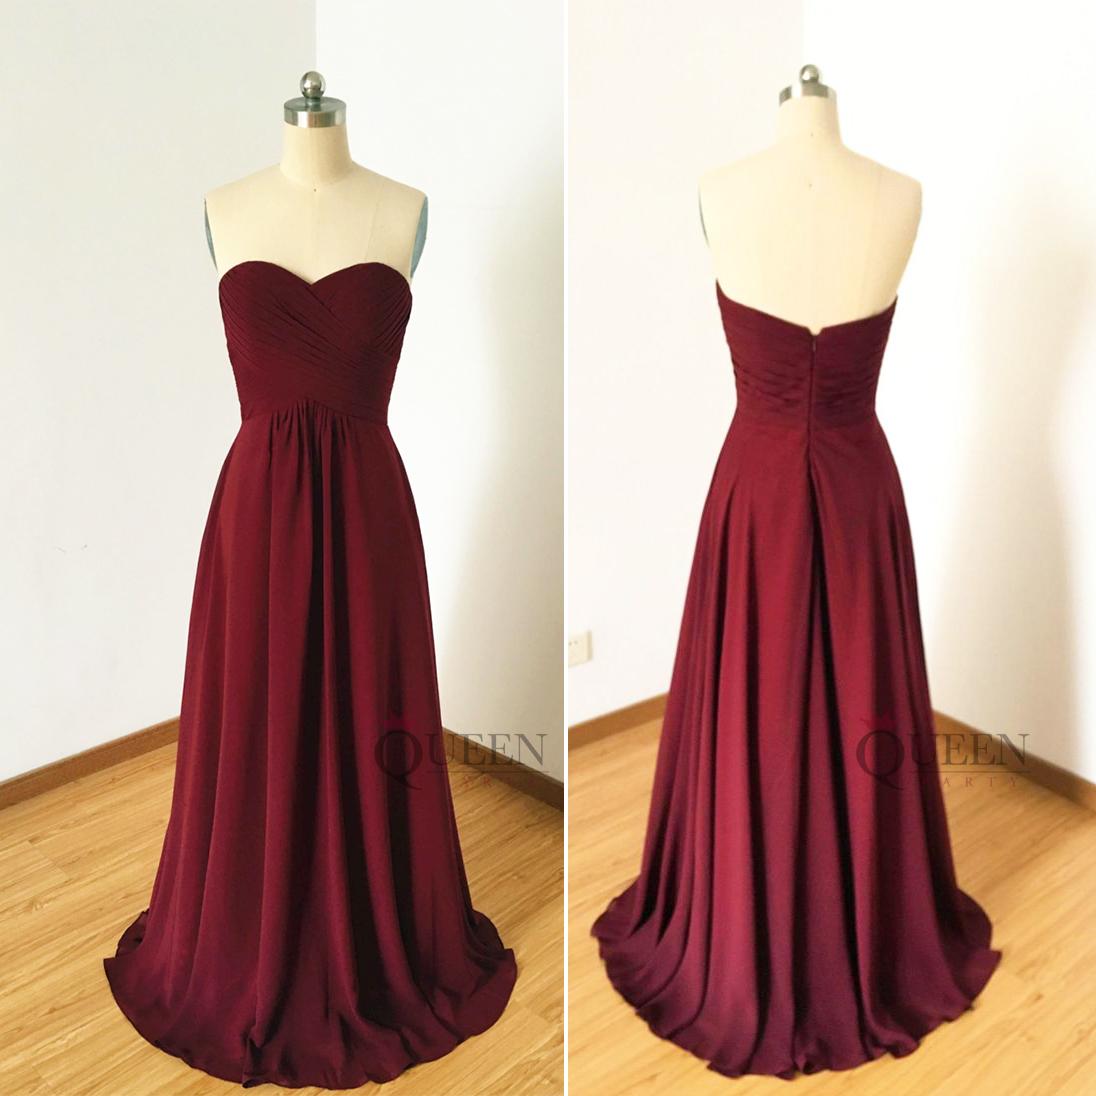 ee11ba491b29 Simple Burgundy Sweetheart Chiffon Long Prom Dress, Strapless Ruffles Bridesmaid  Dresses